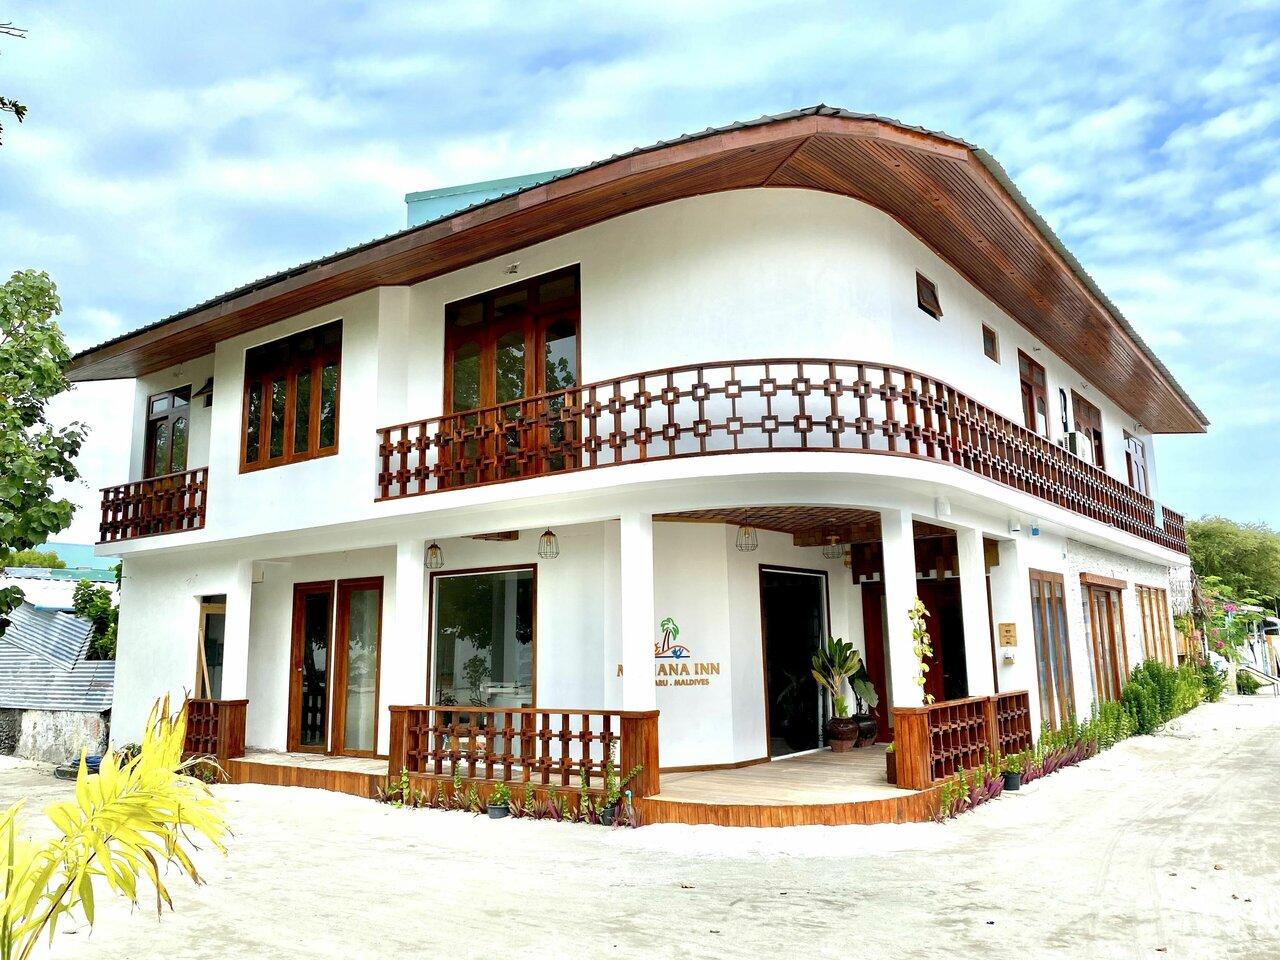 Mariana Inn Maldives